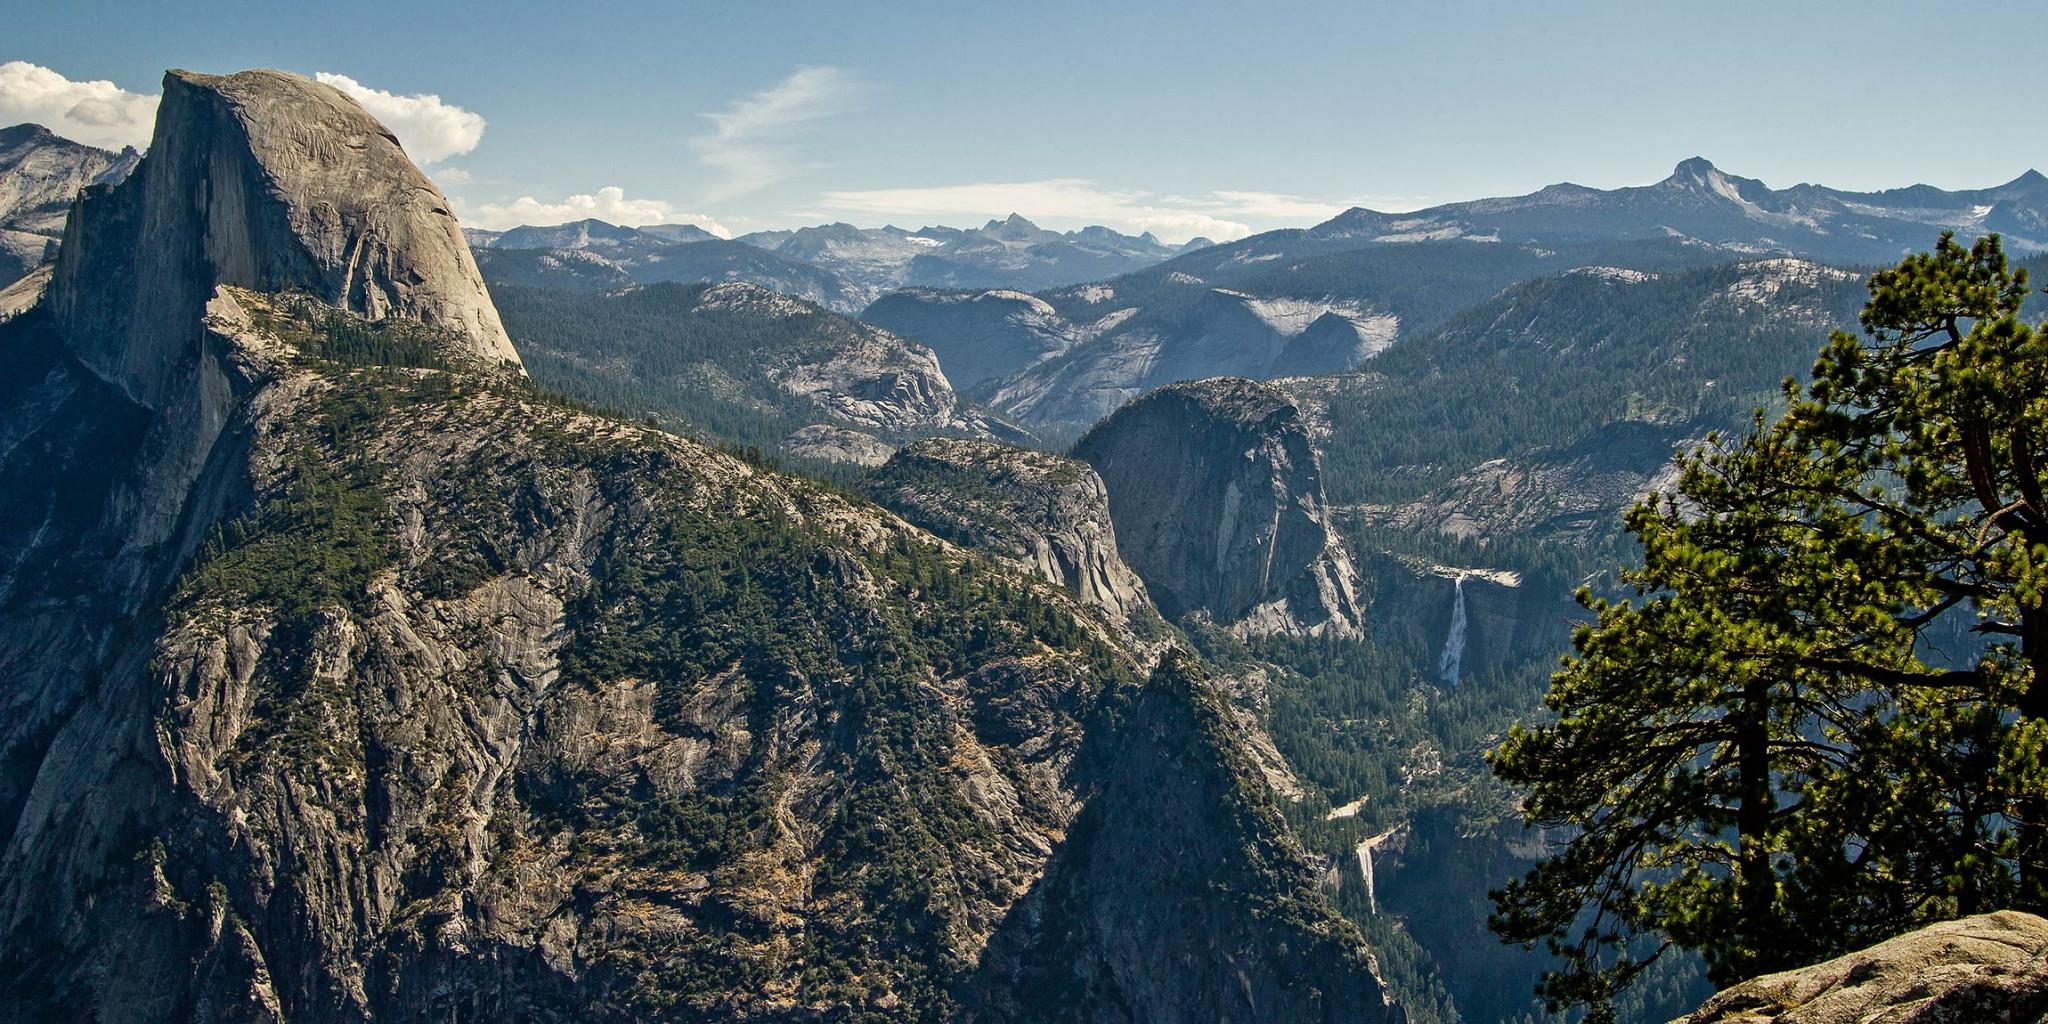 Yosemite National Park, USA © 2011 Uwe Schumacher